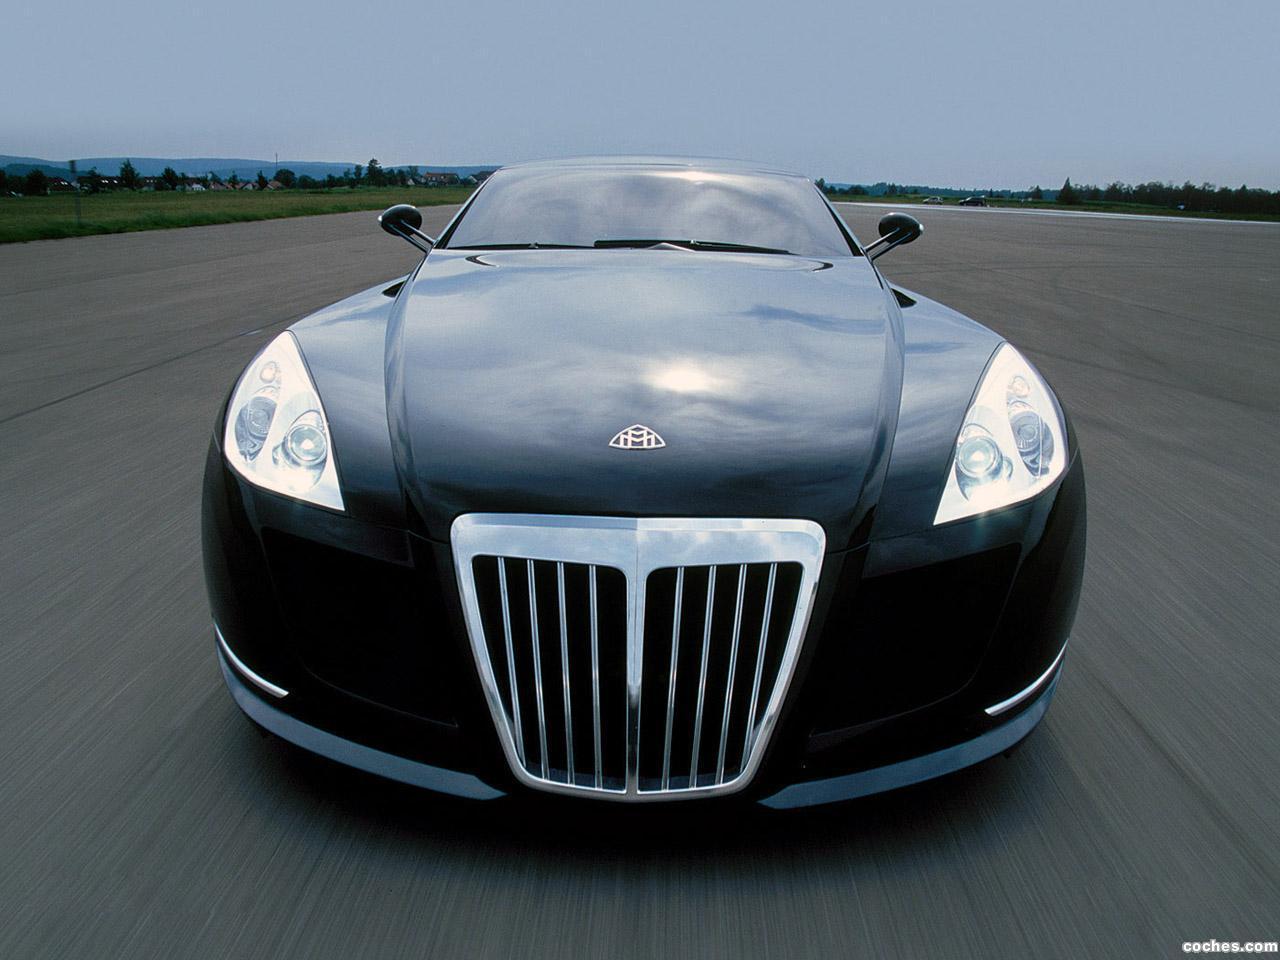 Foto 0 de Maybach Exelero Concept Fulda Tires High Speed Test Car 2005